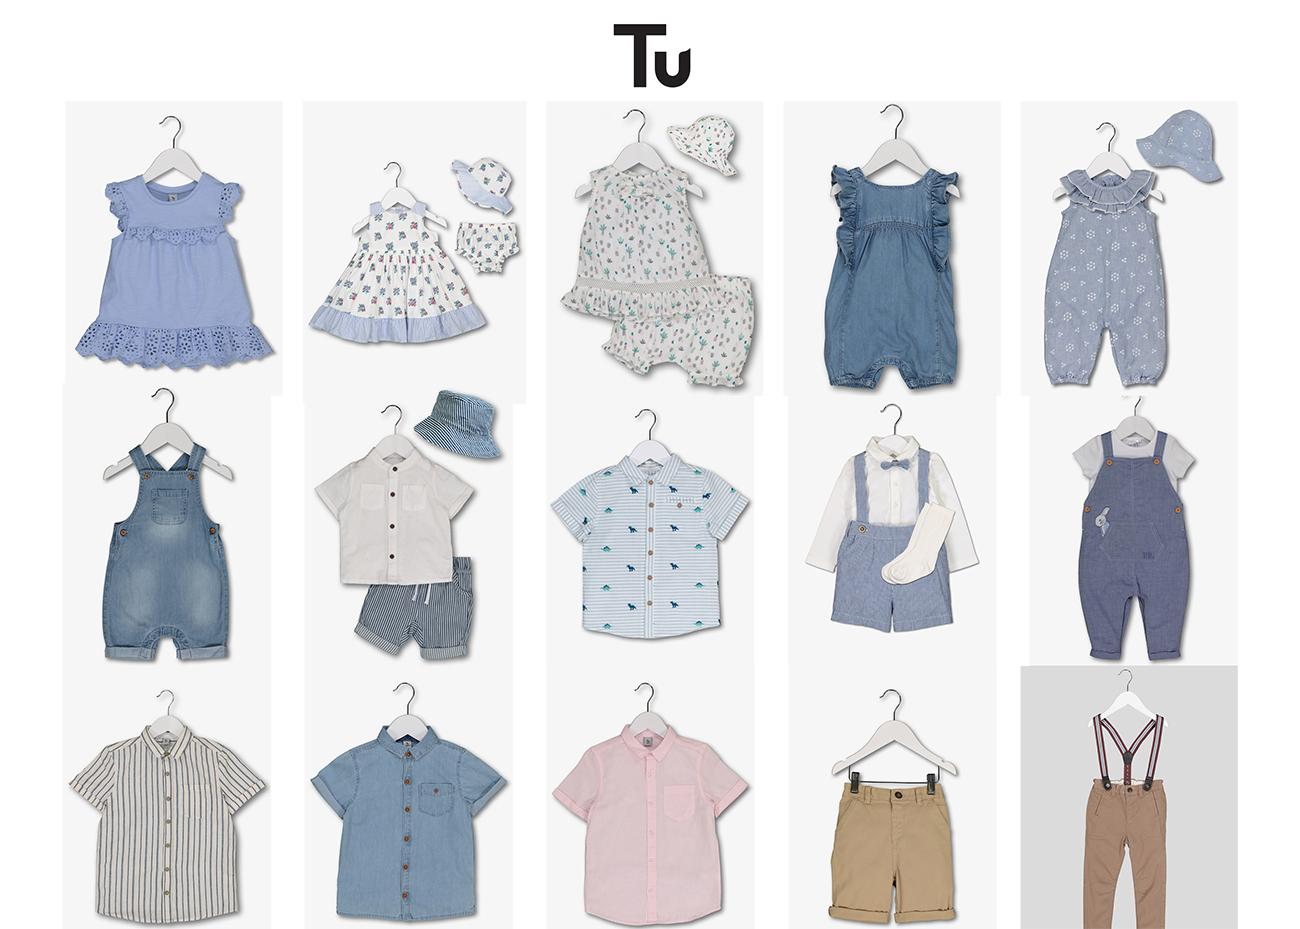 TU Outfit Guide Bluebells Helen Rowan Photography